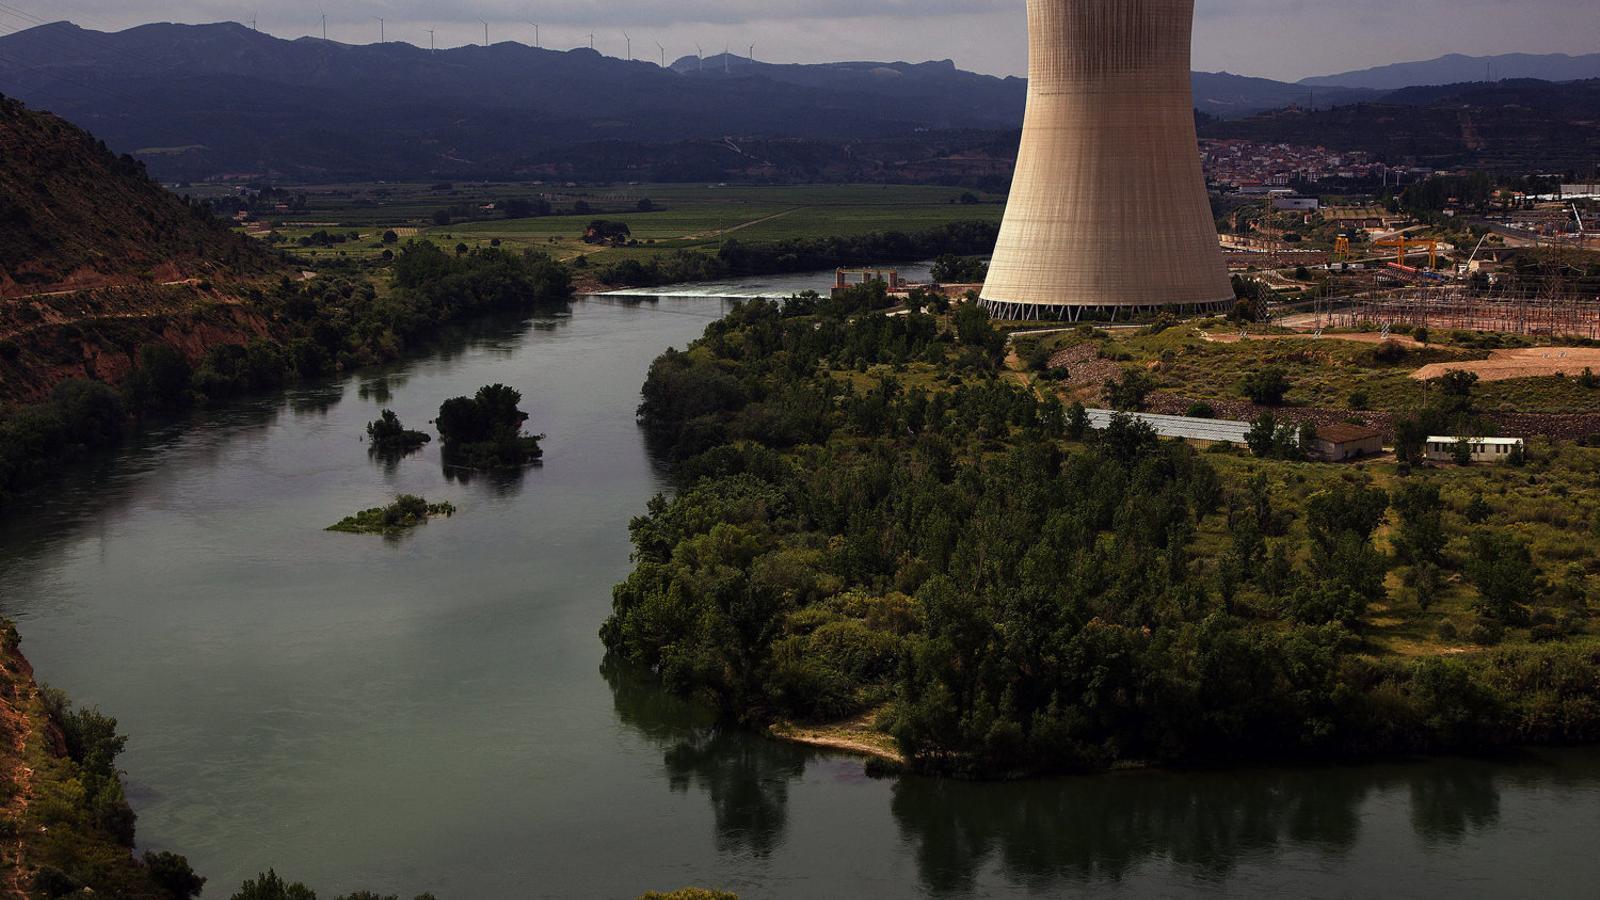 Un forat de 1.800 M€ per tancar les nuclears, que perden diners